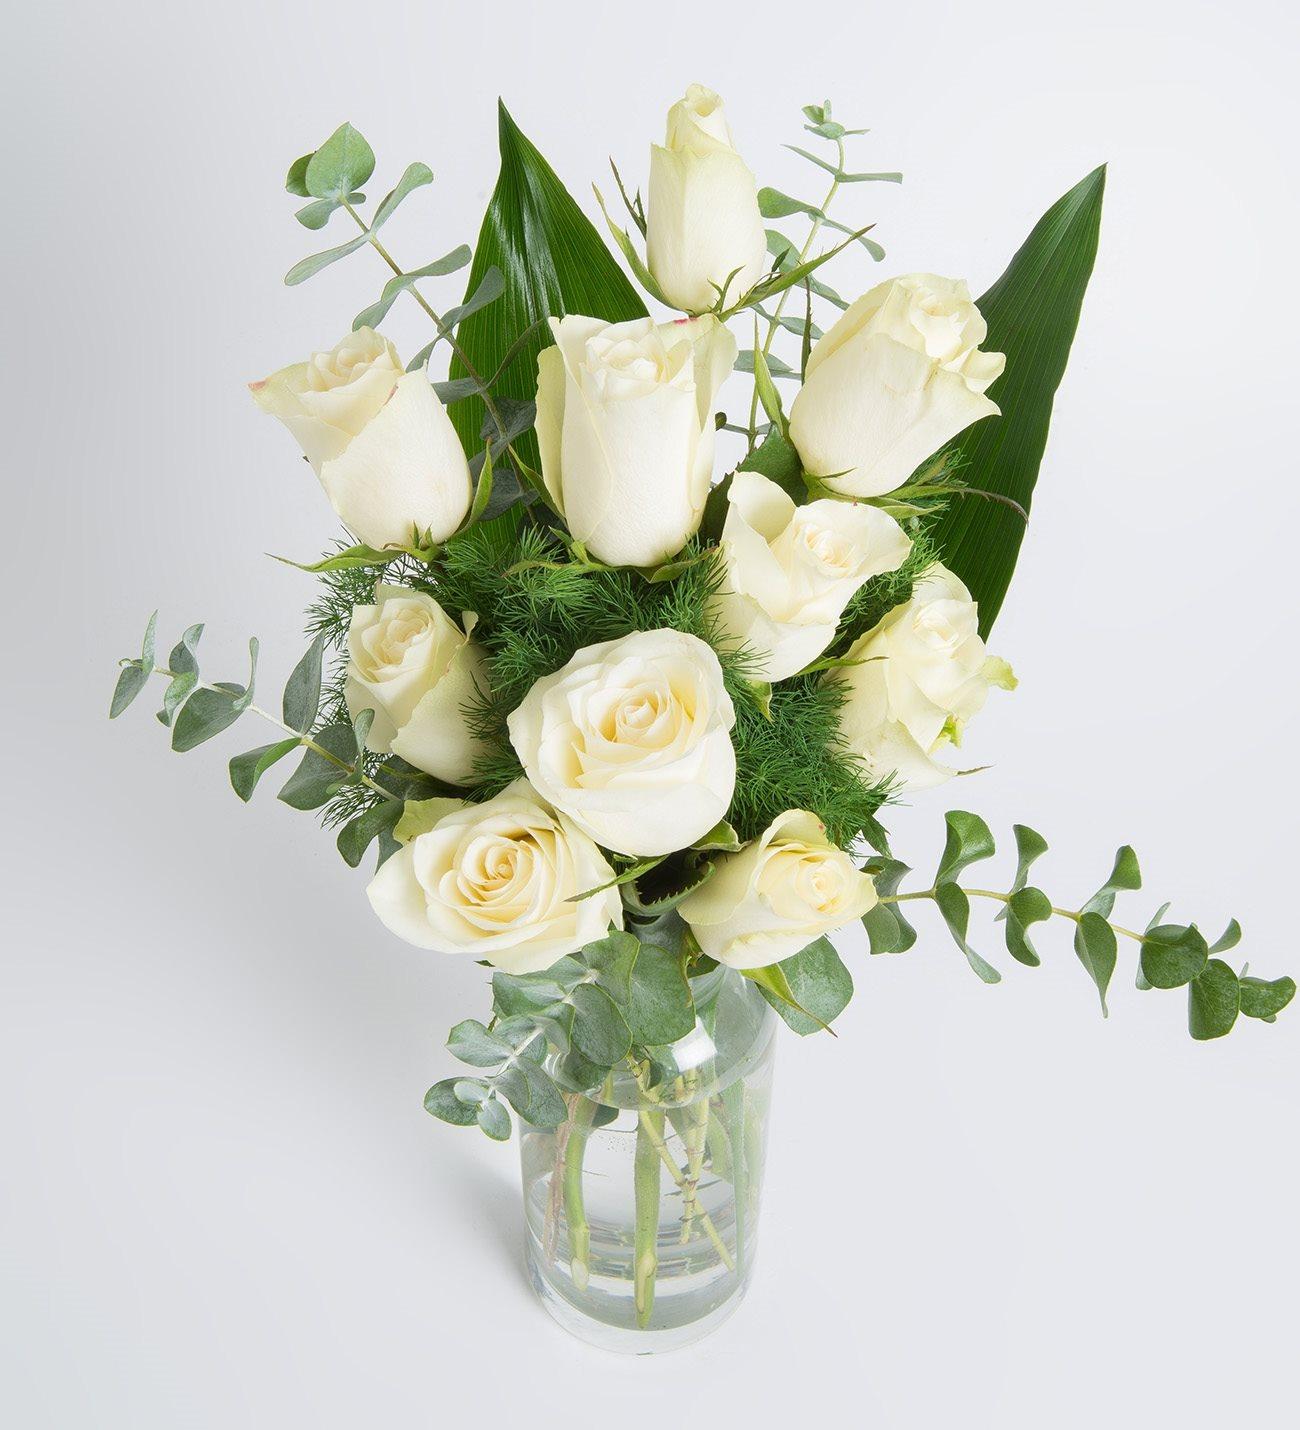 White roses purity of you 10 white roses purity of you izmirmasajfo Images